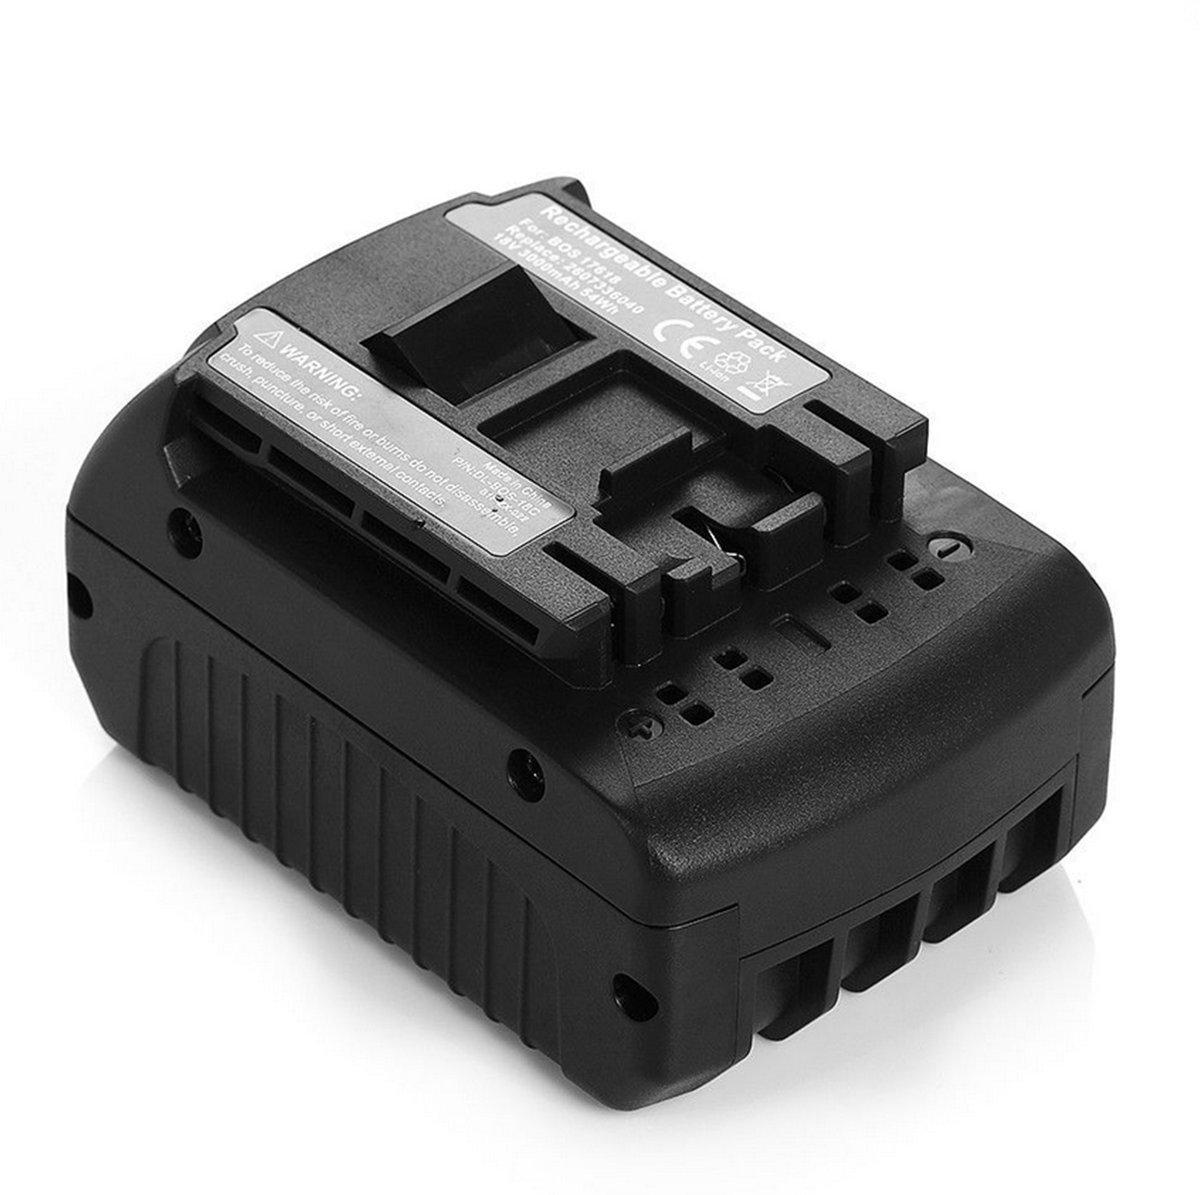 ZTHY 18V 3000mAh Power Tool Battery For Bosch 17618 BAT609 BAT618 2 607 336 092